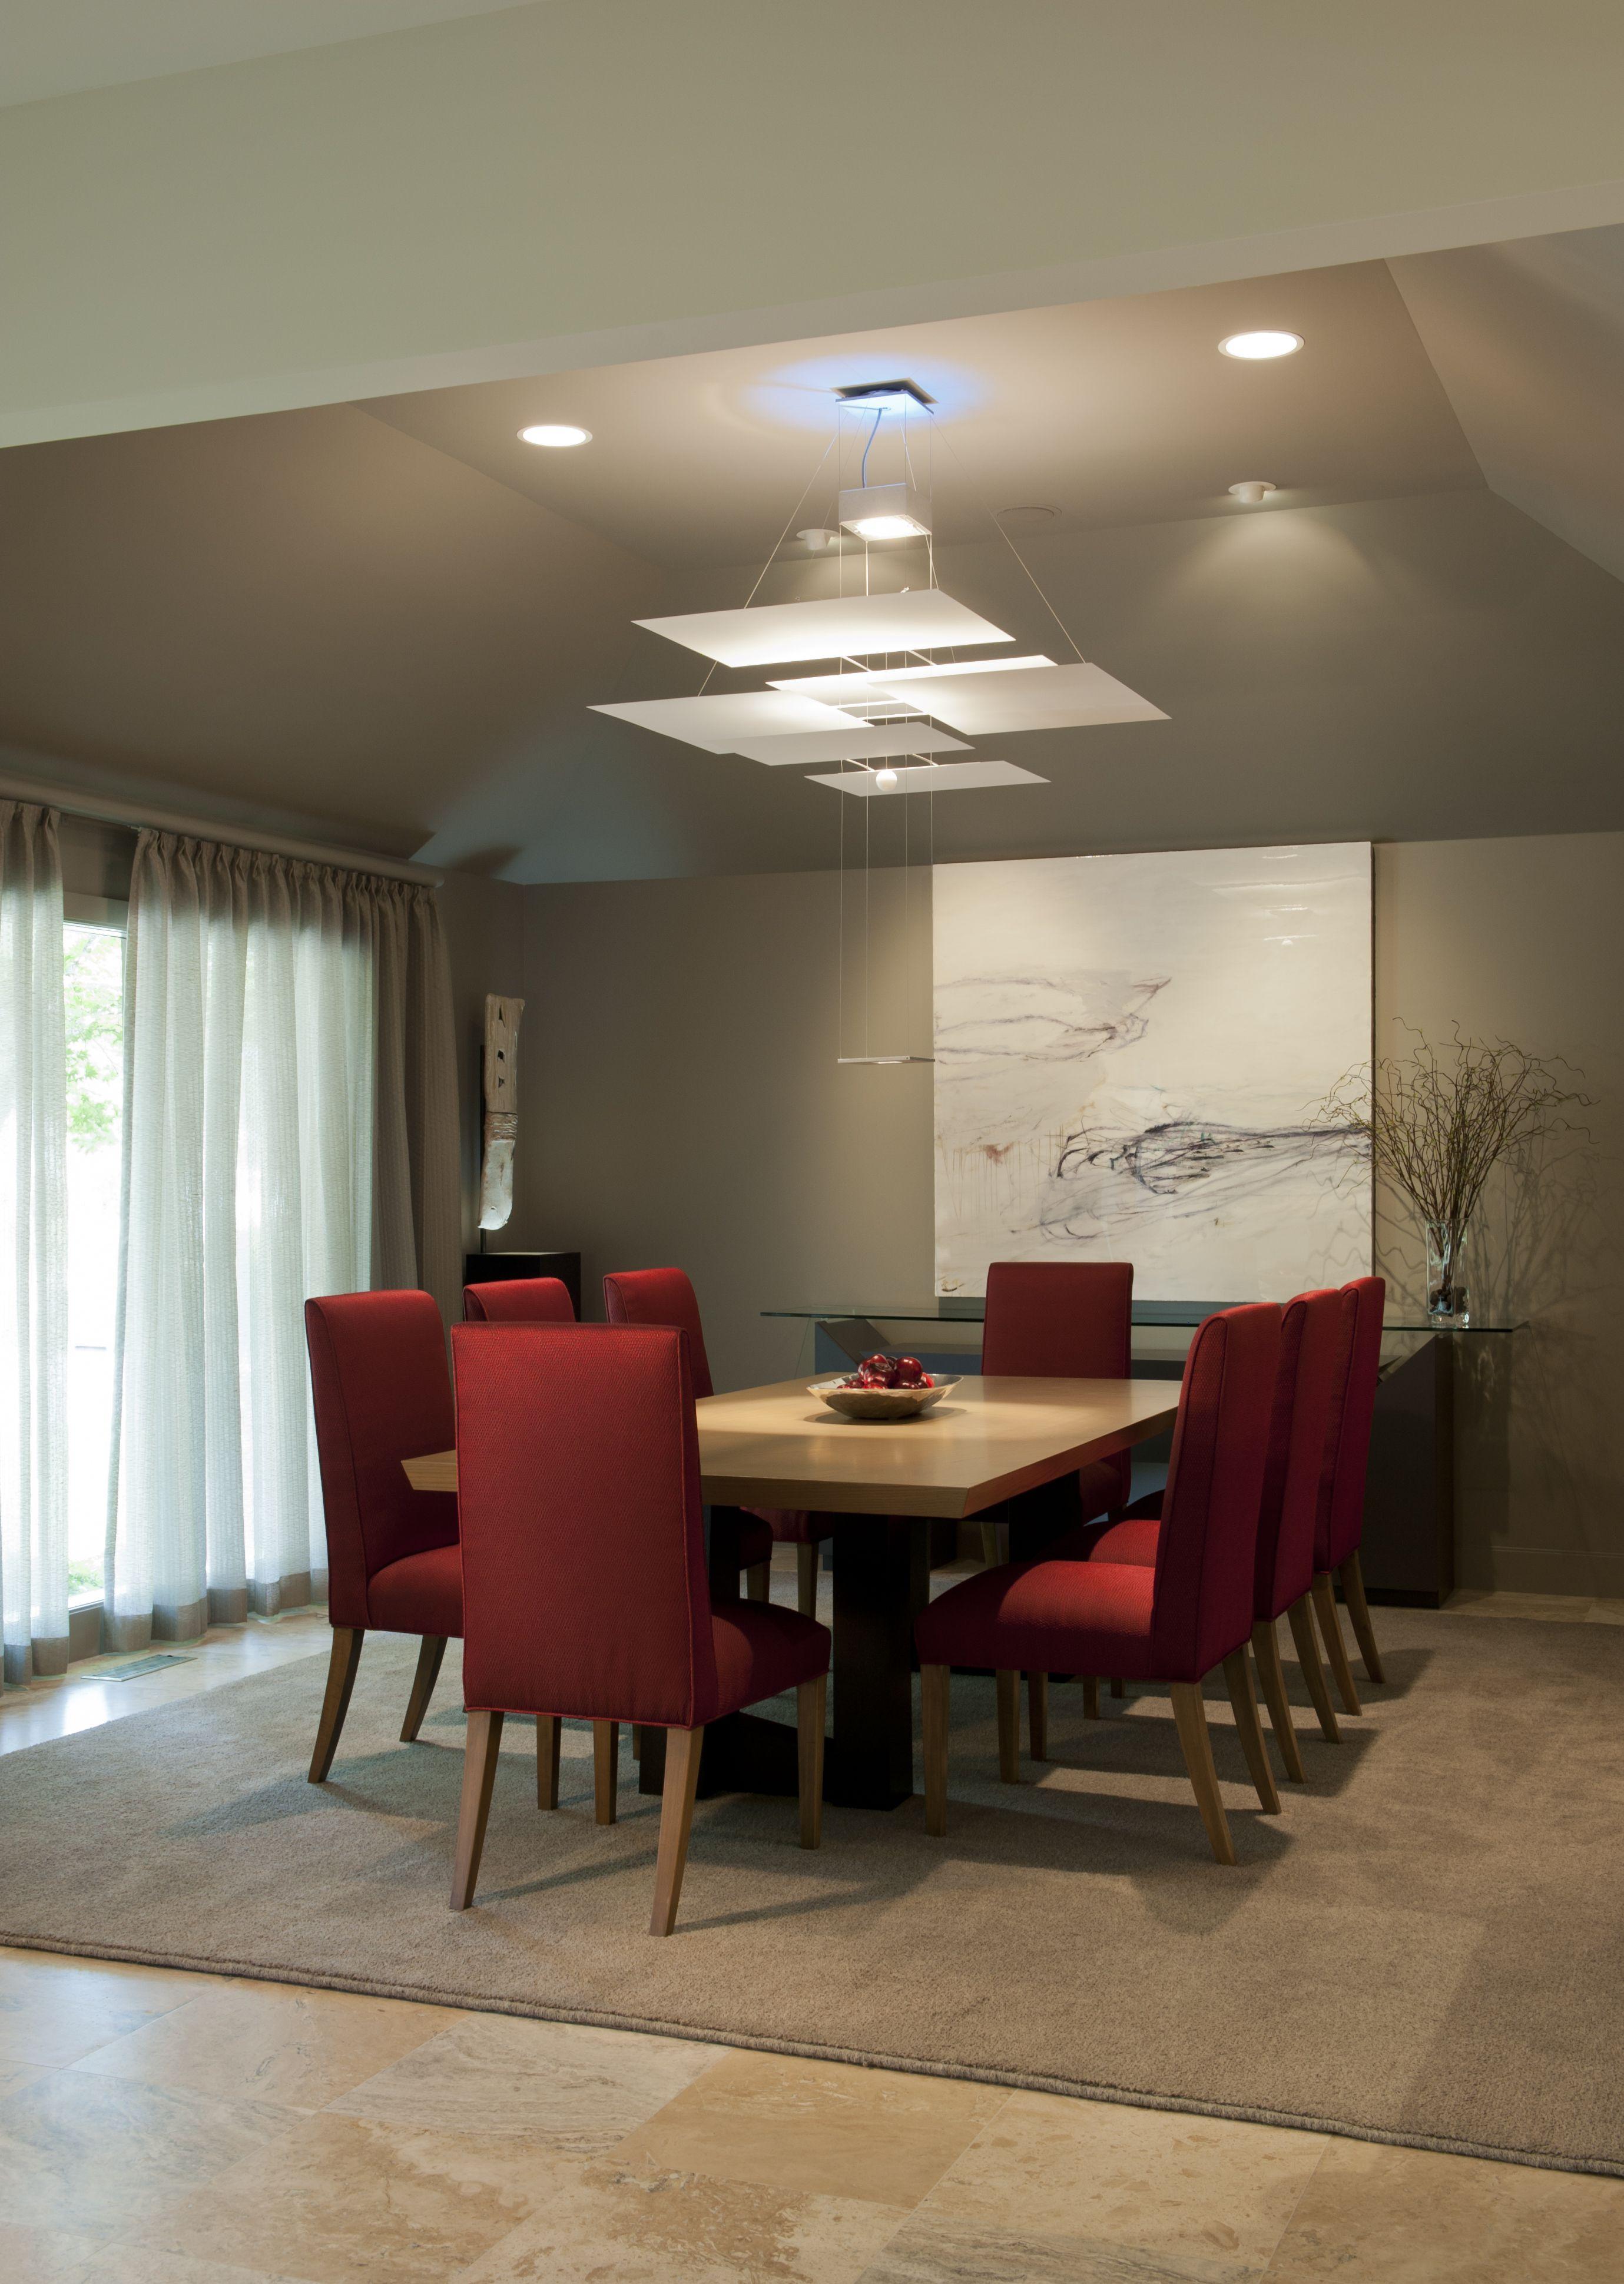 Dining Room From Doug Campbell Tulsa Interior Designer Facebook Page Https